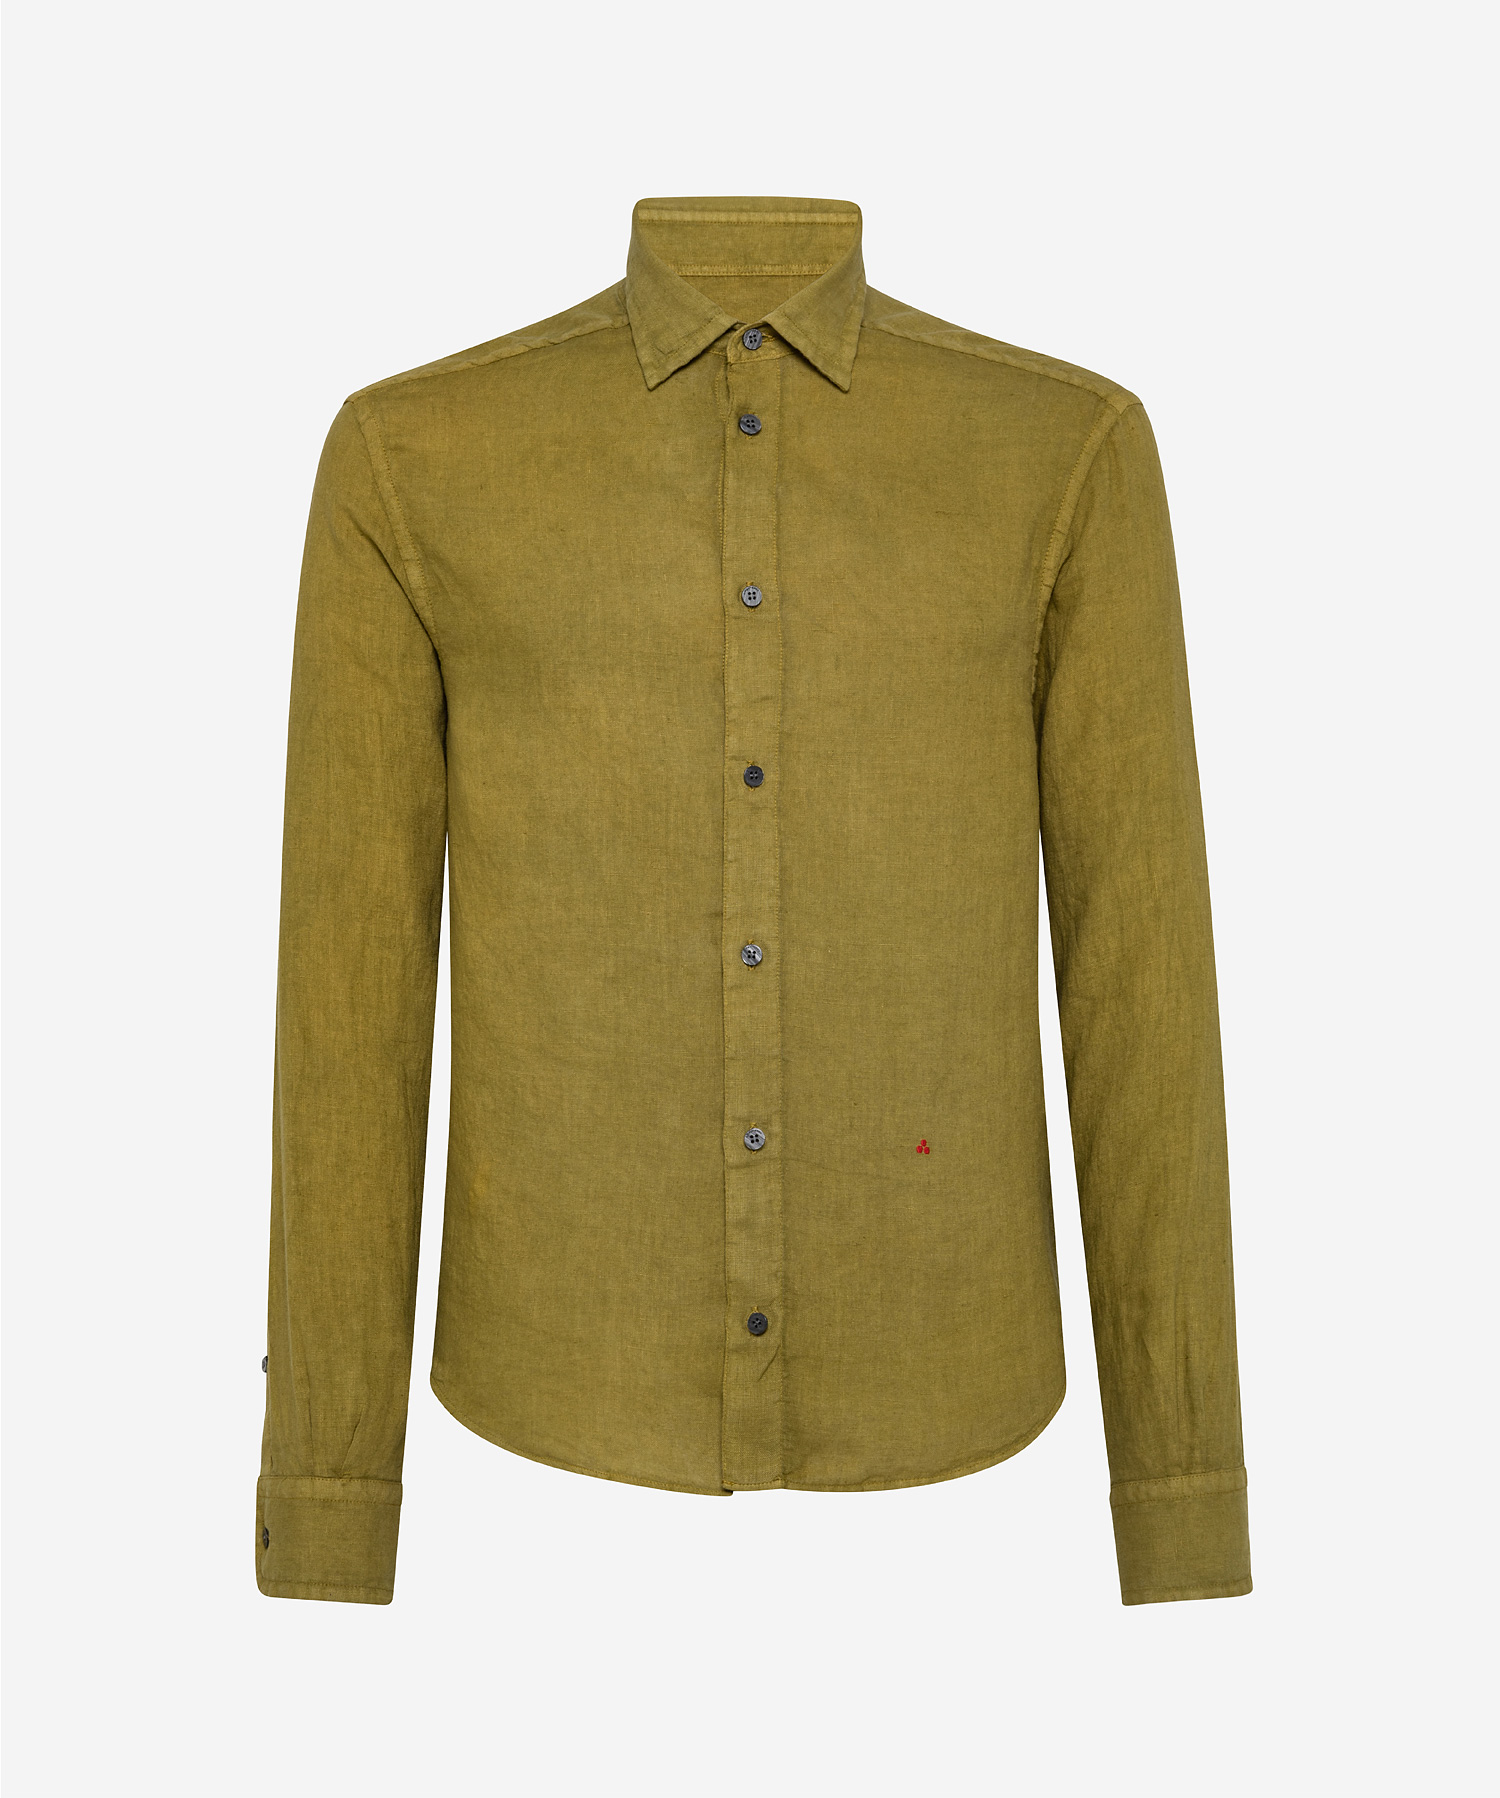 Peuterey_Man_Topwear_Linenshirt_Green_PEU310599010143653_3_unq16467.jpg